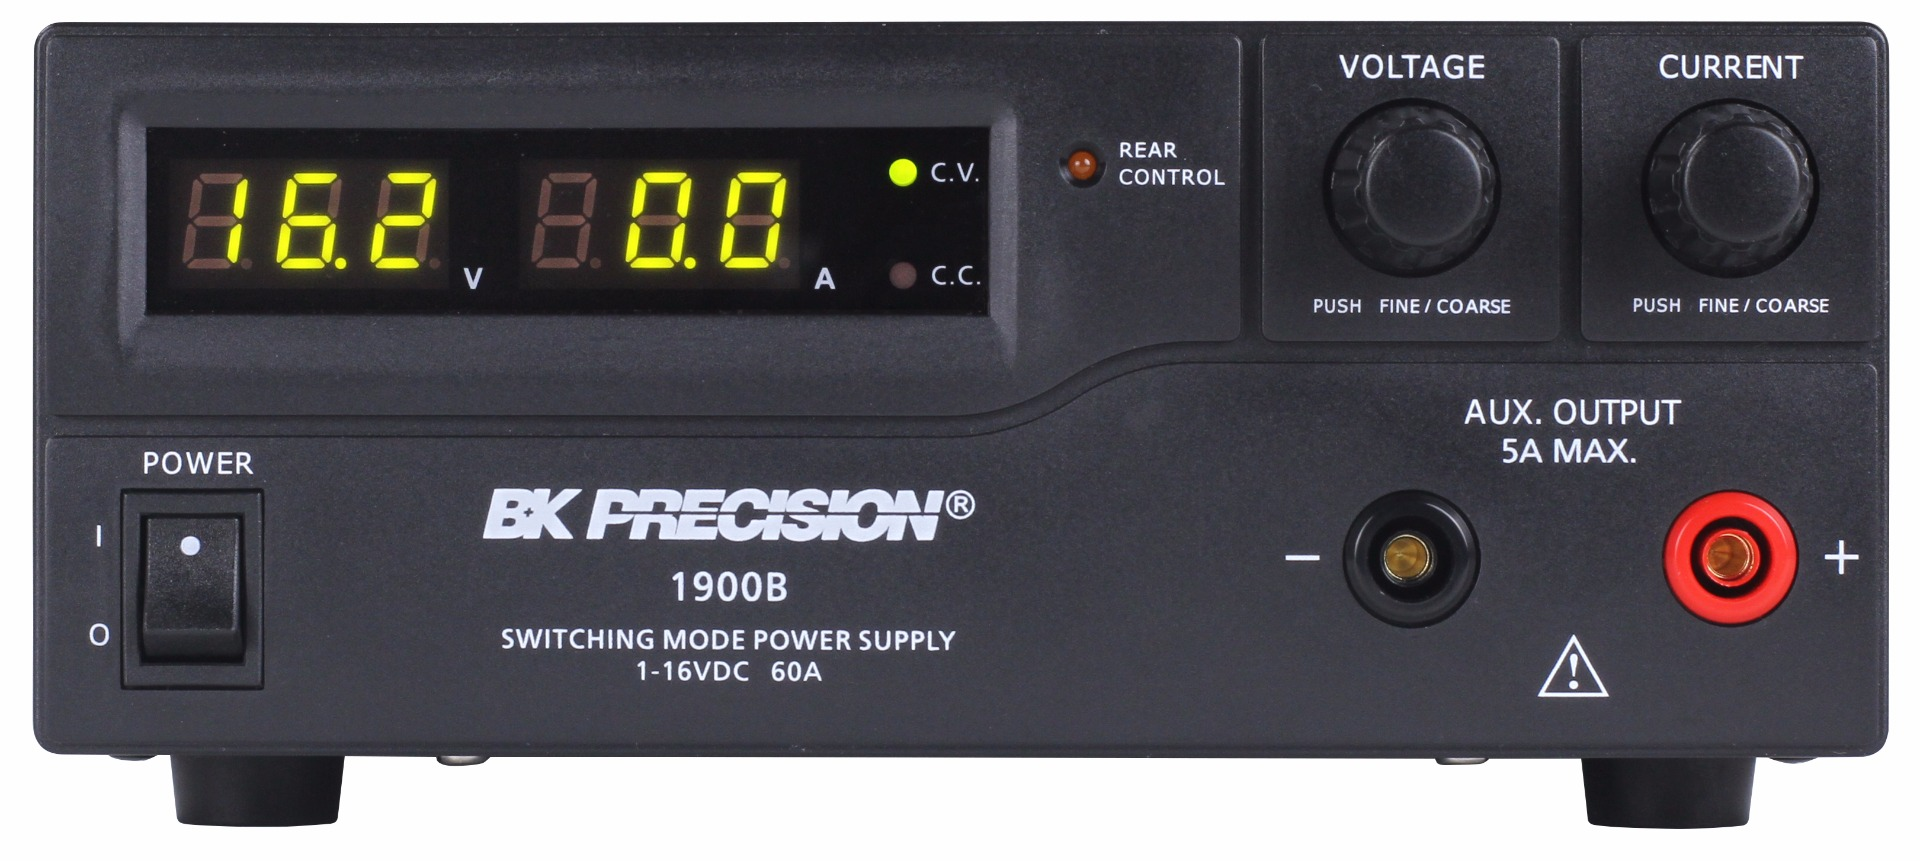 Image of BK-Precision-1900B by Valuetronics International Inc